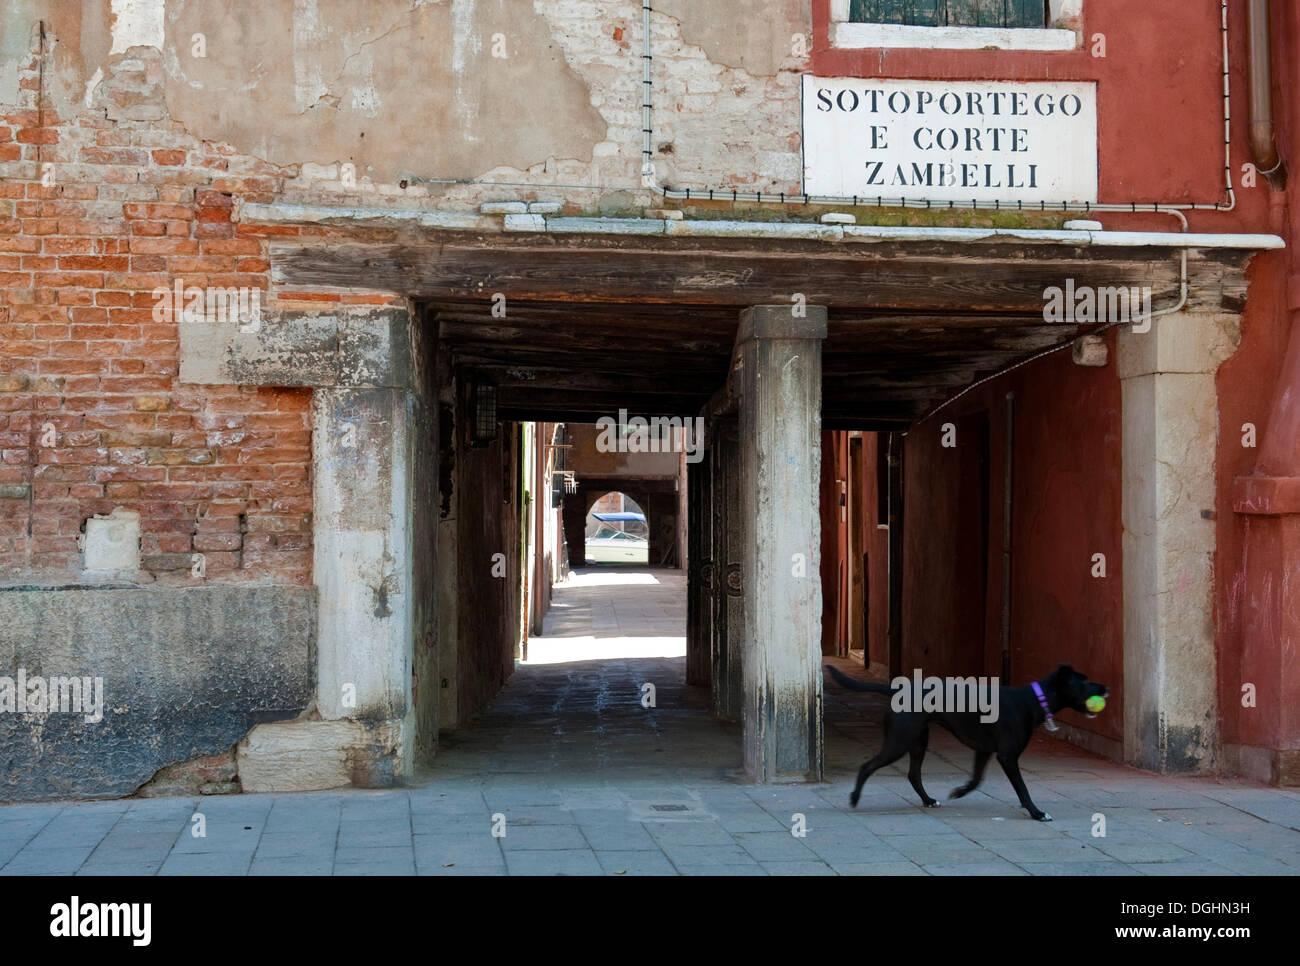 Dog in front of the passage Sotoportego e Corte Zambelli, at the Campo San Giacomo dall'Orio, Venice, Veneto, Italy, Europe - Stock Image